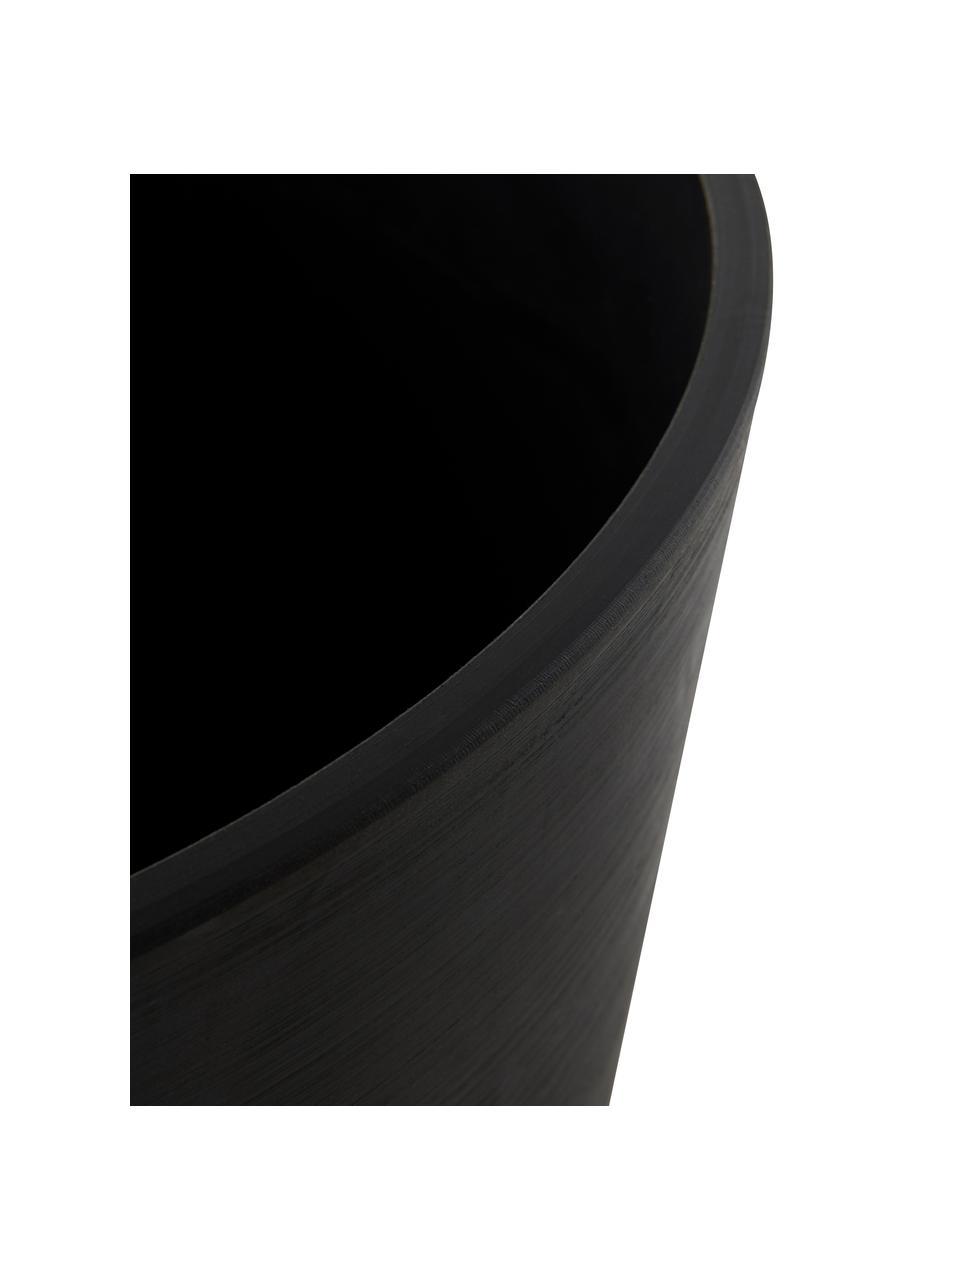 Großer Blumentopf Malcolm, Kunststoff, Schwarz, Ø 41 x H 34 cm